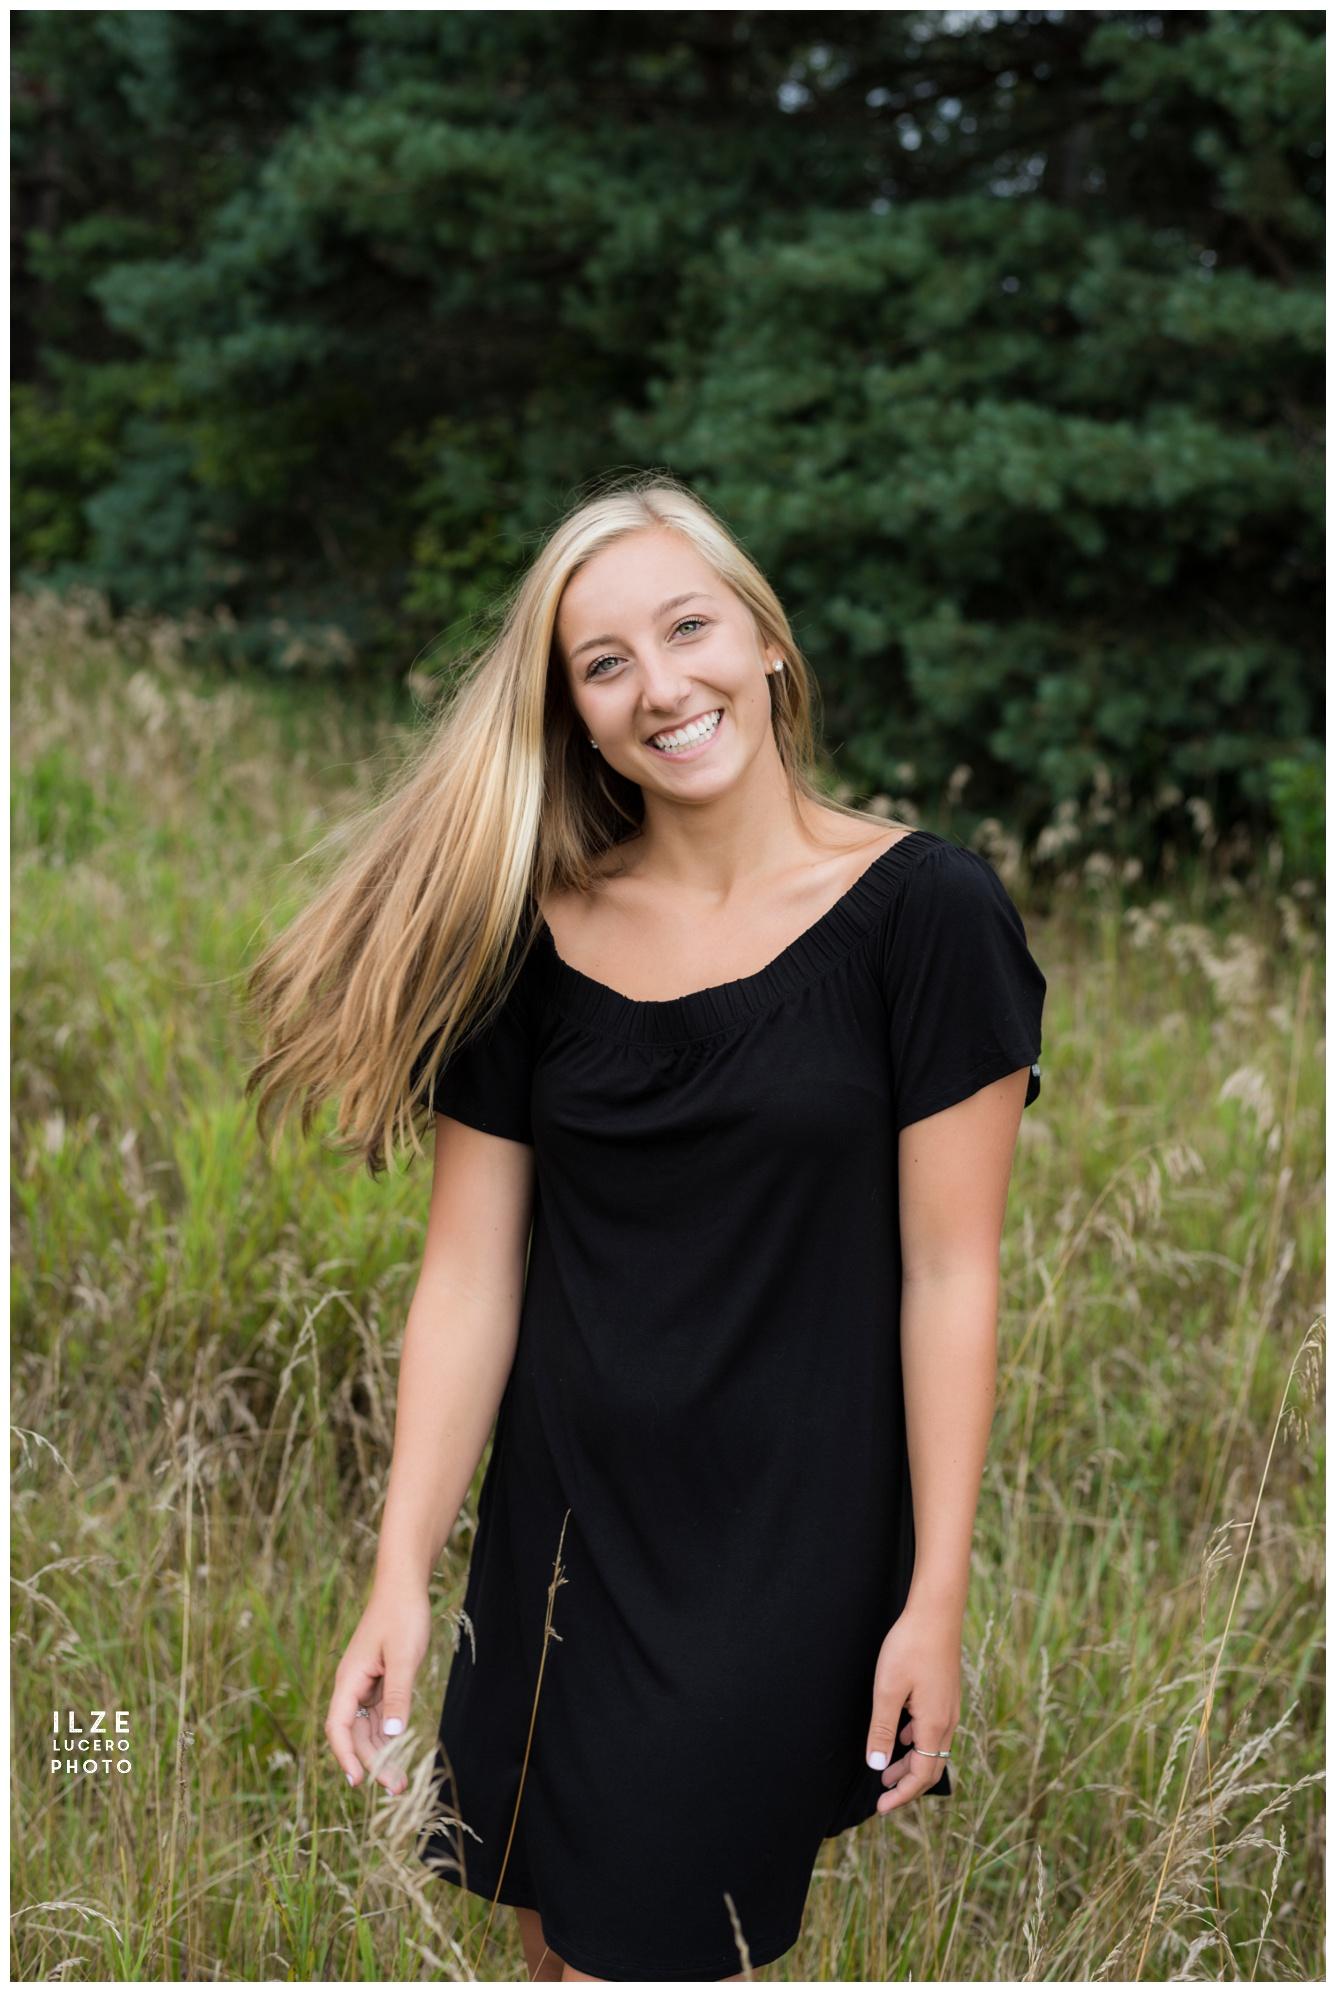 Ortonville senior photo shoot